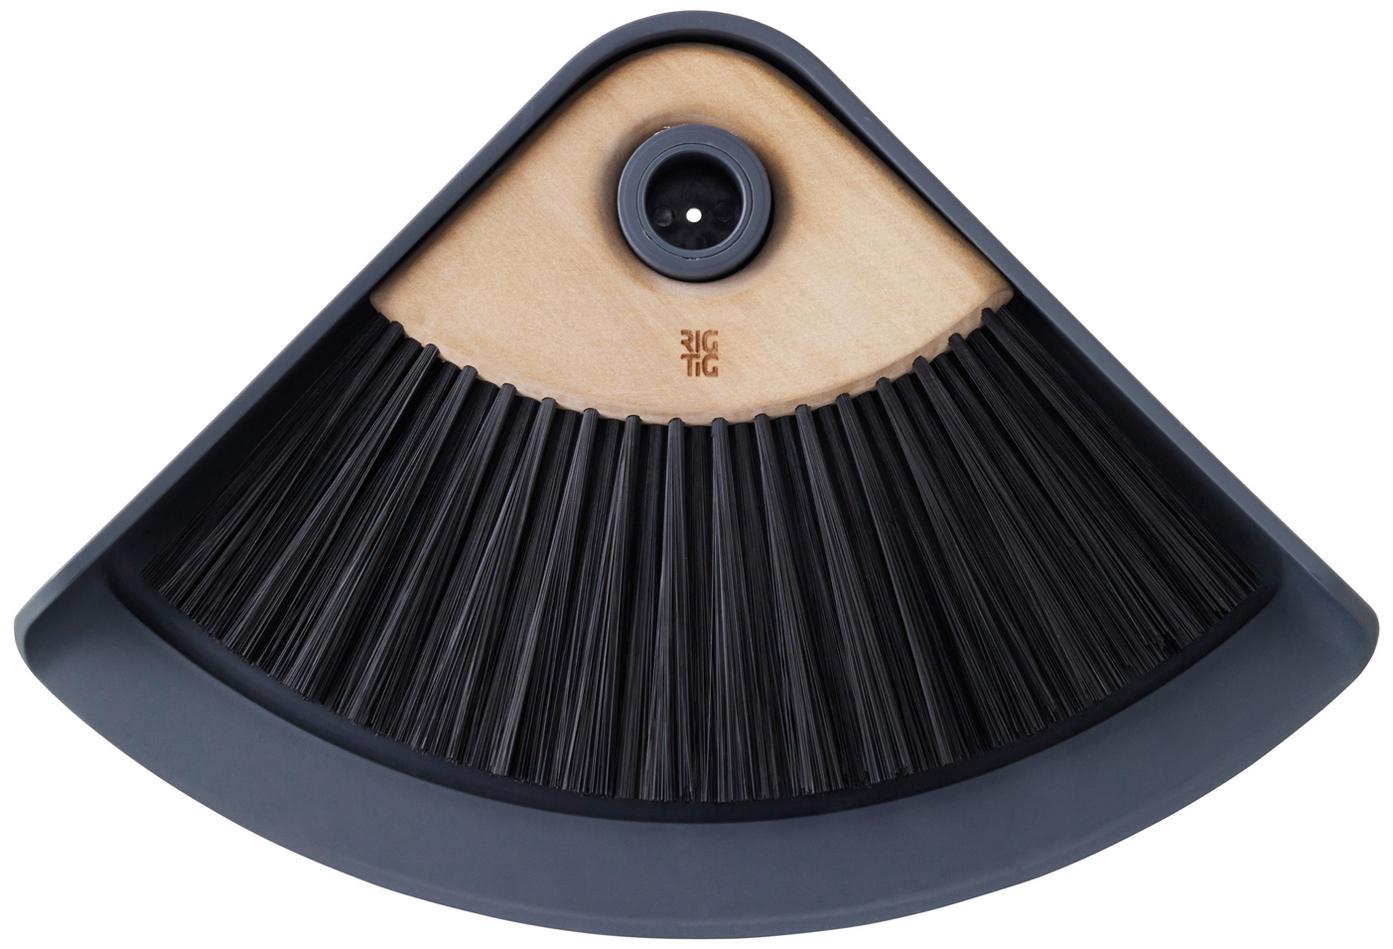 Stoffen en blik Sweep-It, Kunststof, lotushout, Stofblik: grijs Borstel handveger: zwart, handvat Handborstelgreep: bruin, 20 x 28 cm